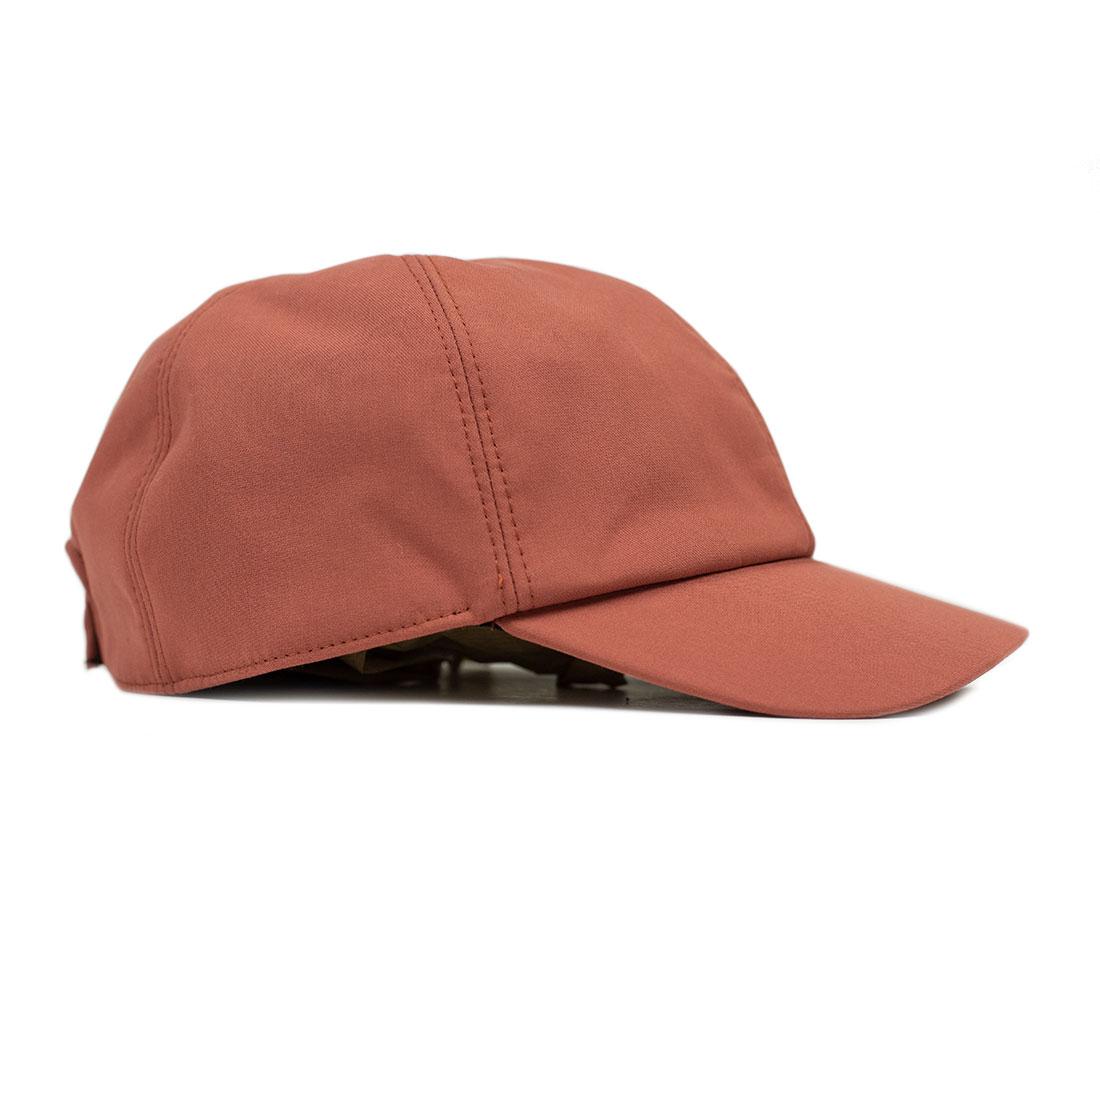 Stephan Schneider Spring Summer 2021 SS21 Cap Baseball Hat (2).jpg